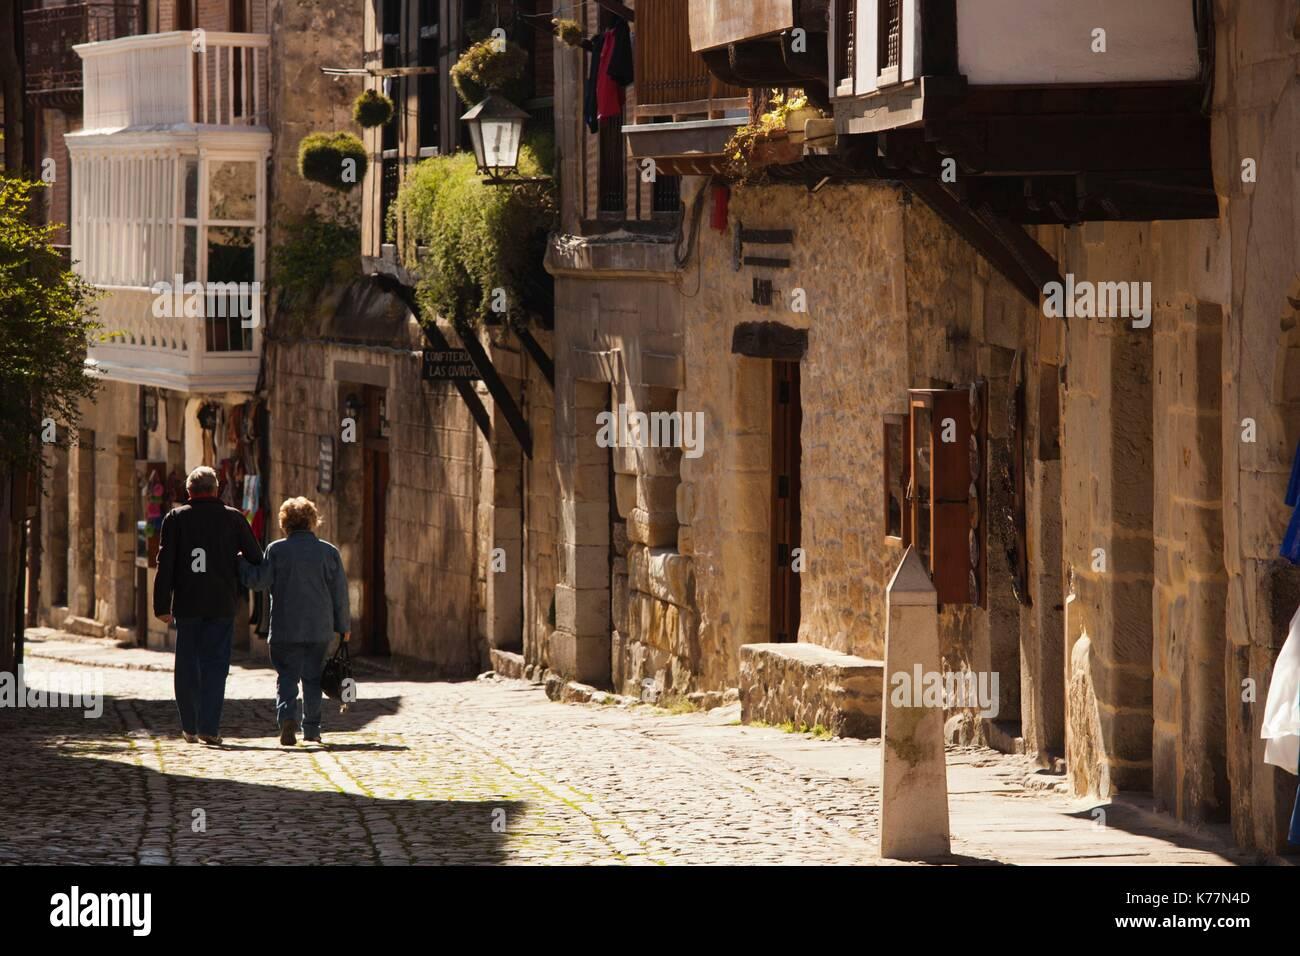 Spain, Cantabria Region, Cantabria Province, Santillana del Mar, tourists in midieval town, Stock Photo